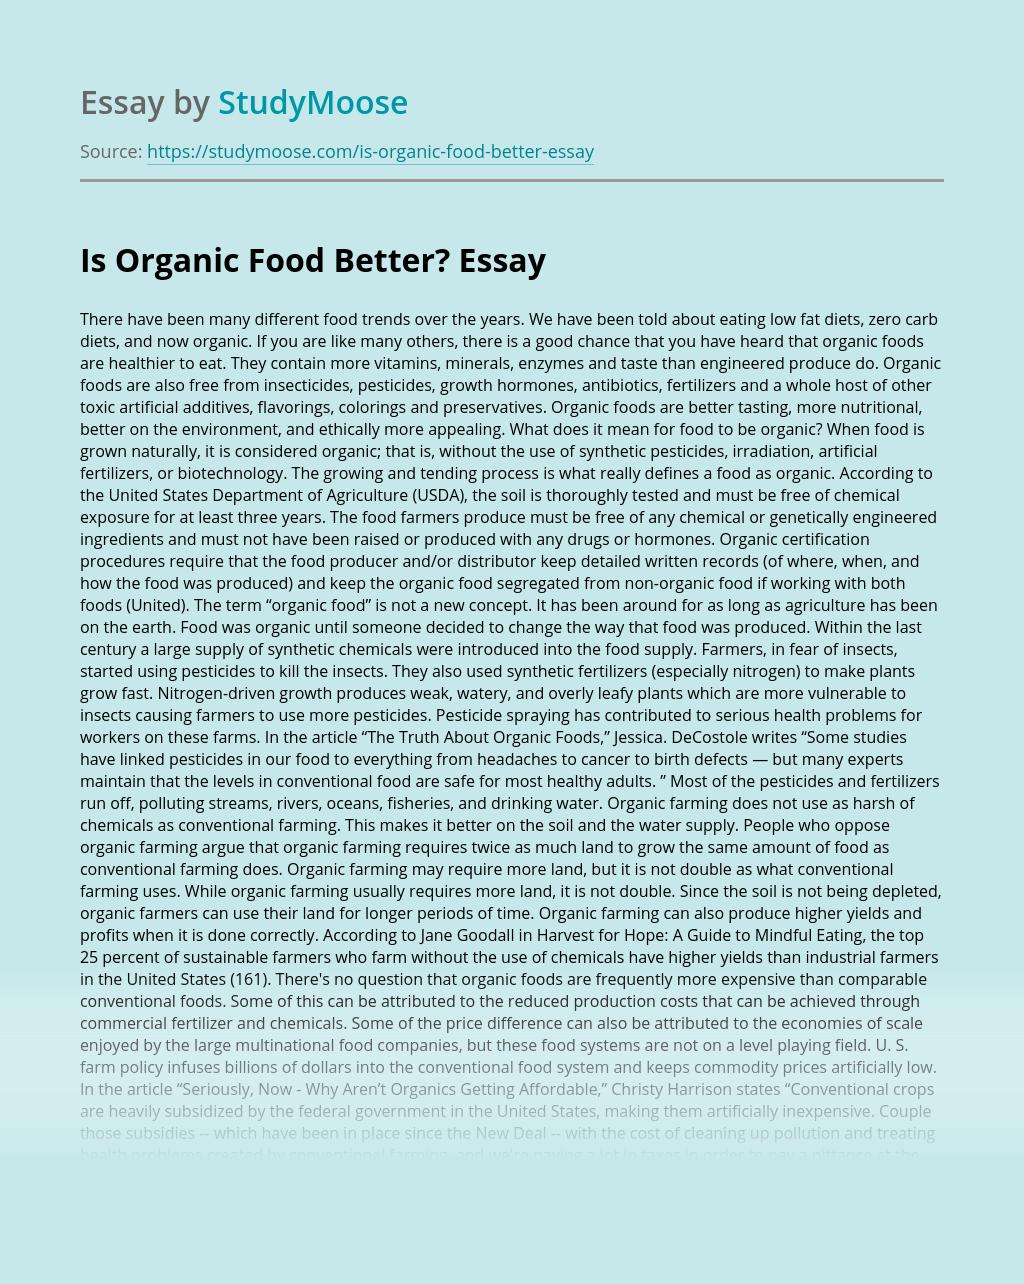 Is Organic Food Better?